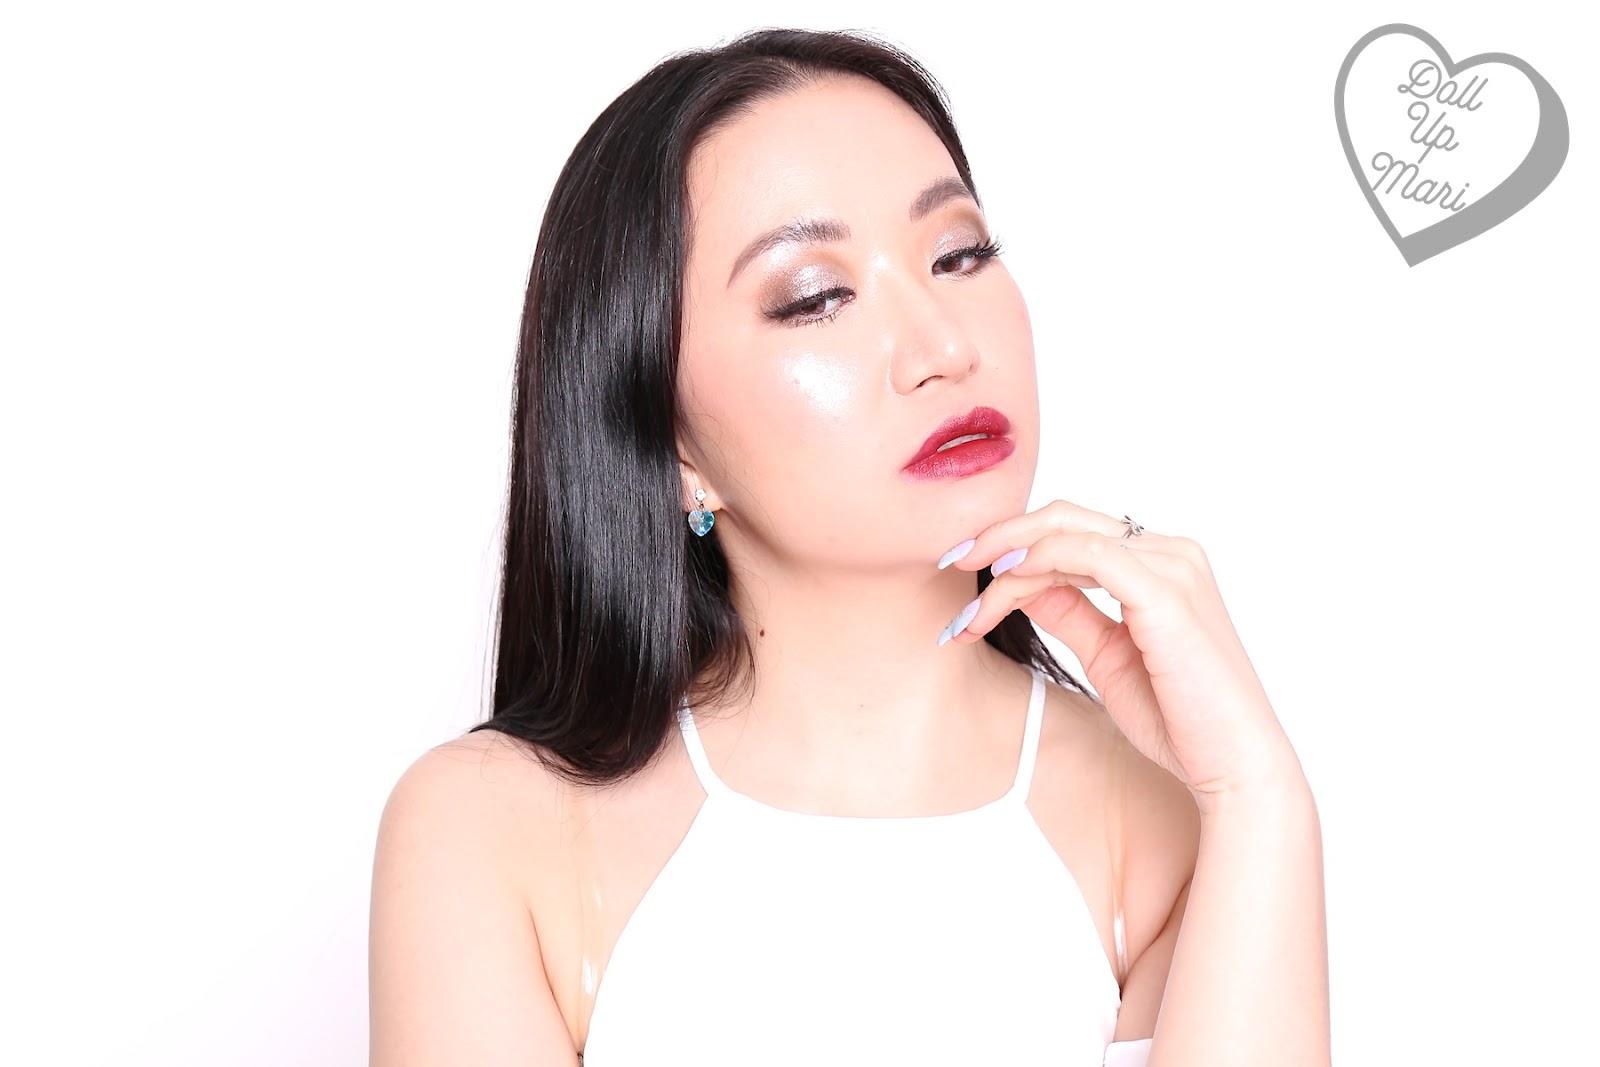 Mari wearing Superb Wine shade of AVON Perfectly Matte Lipstick